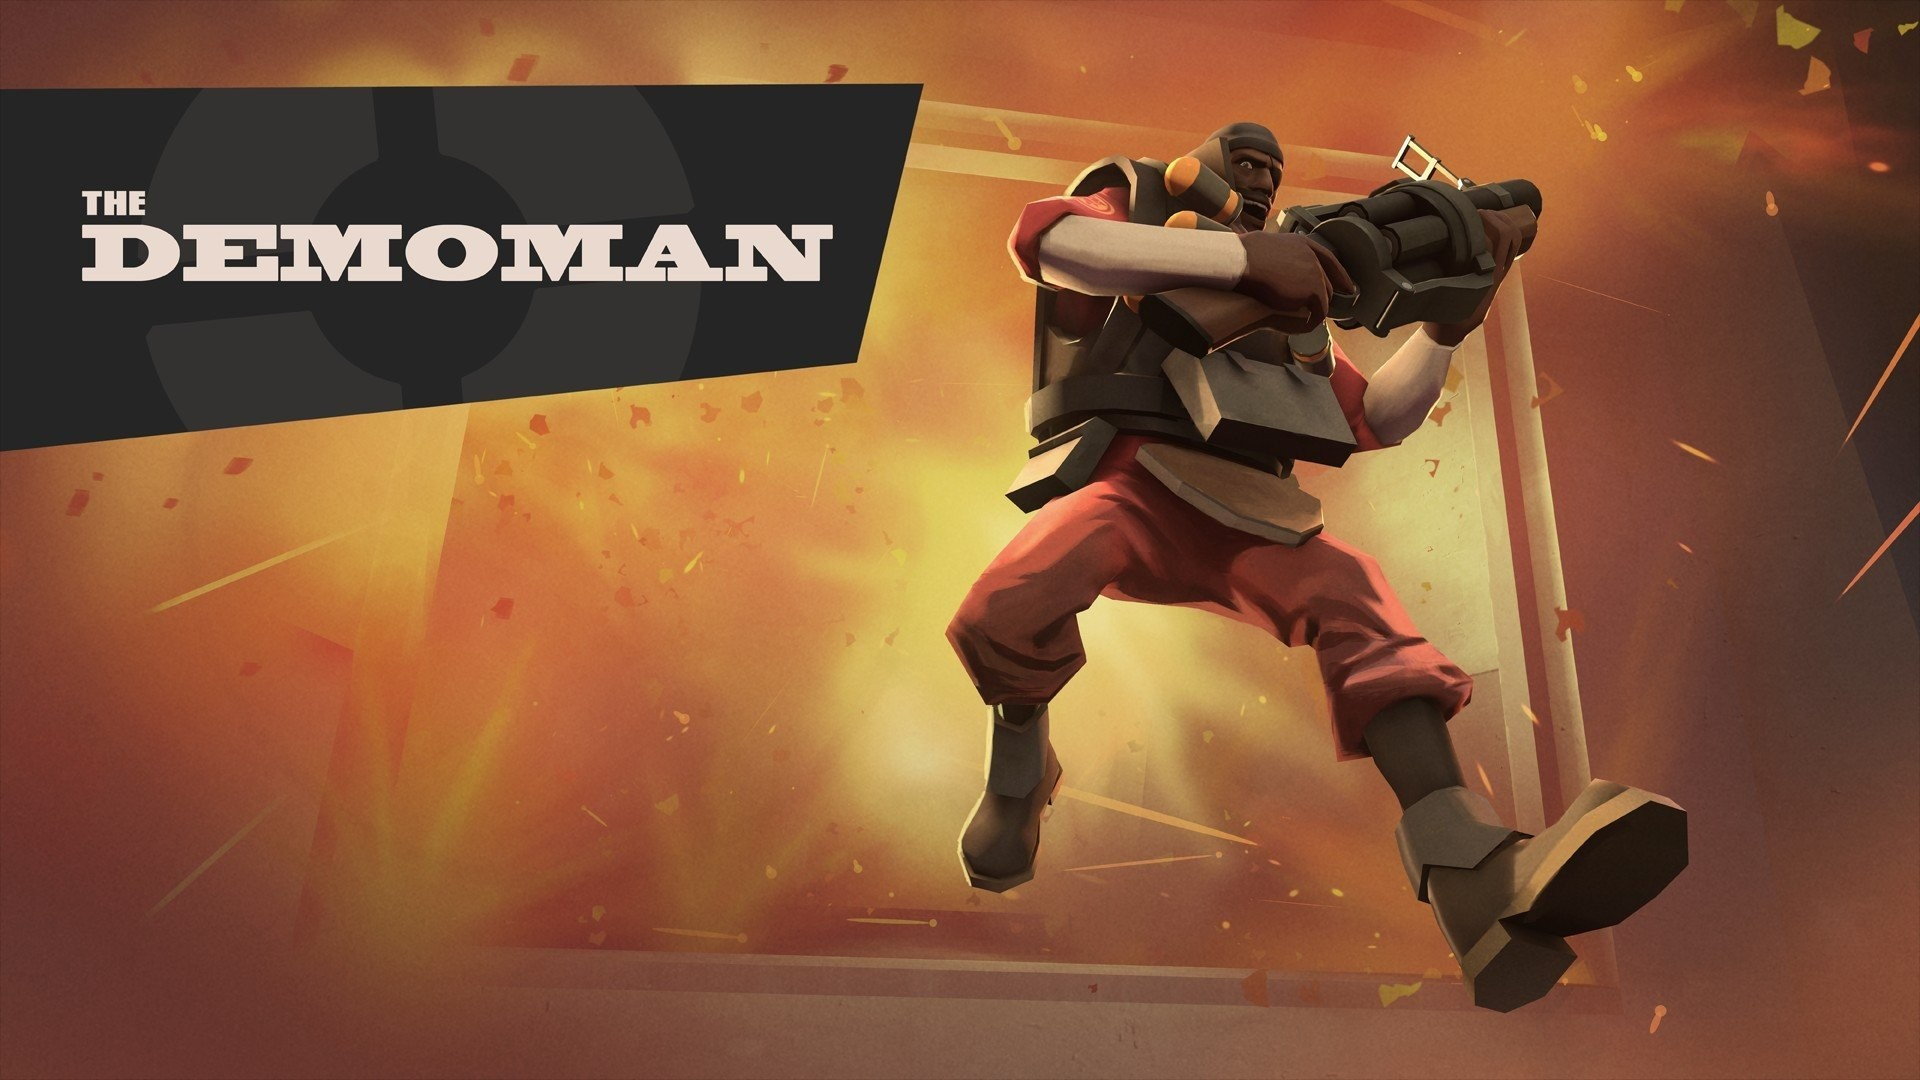 Image result for demoman tf2 wallpaper